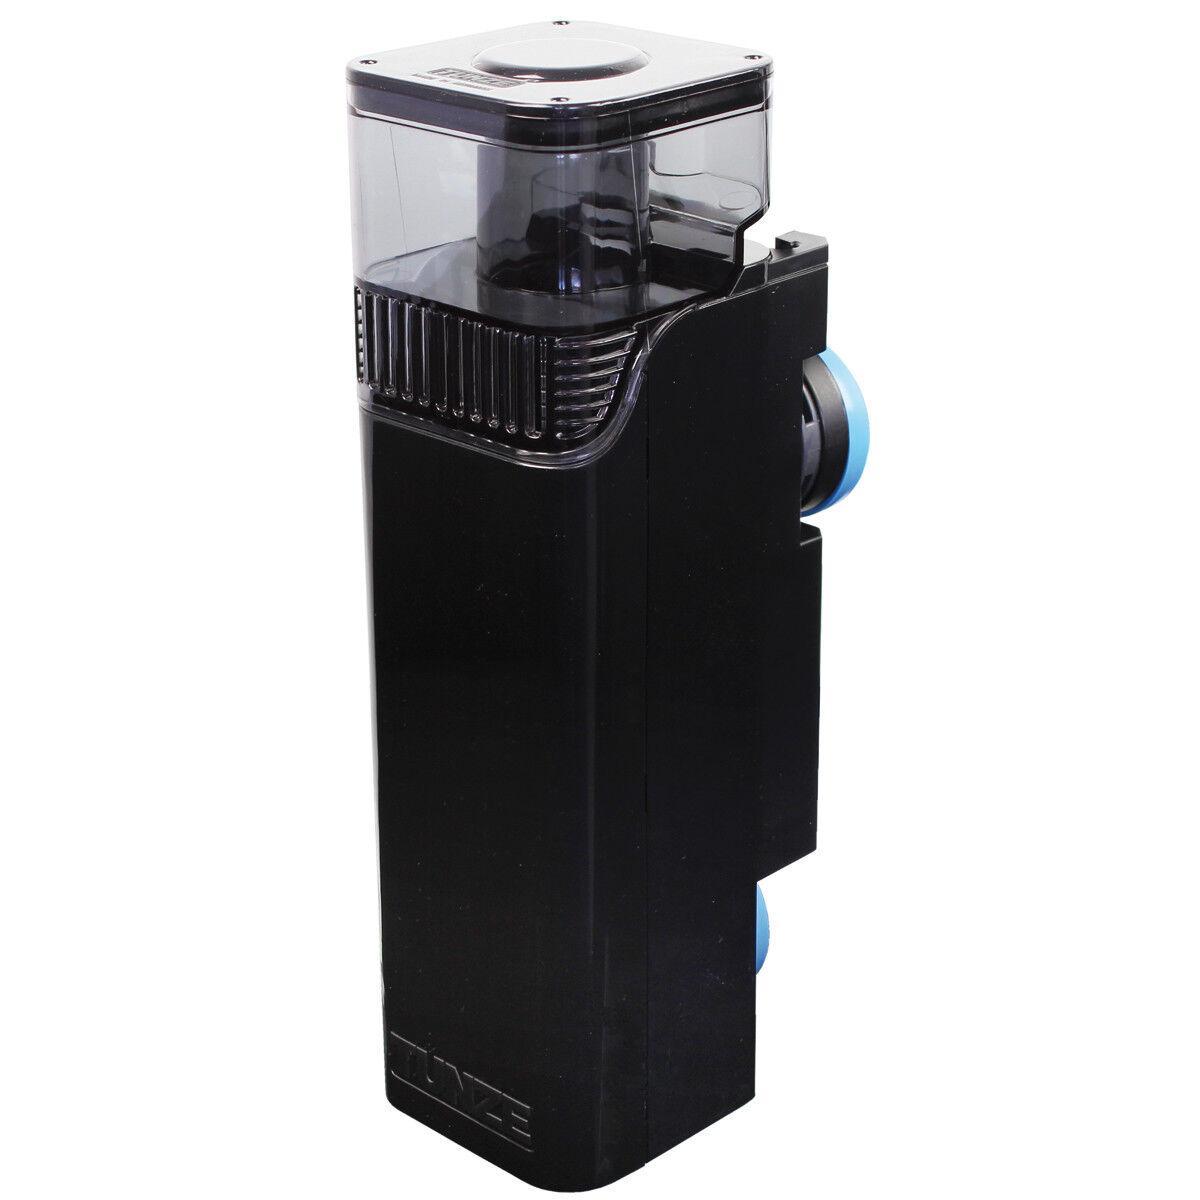 Tunze Comline 9004 DOC Predein Skimmer for aquariums 15-45 gallons